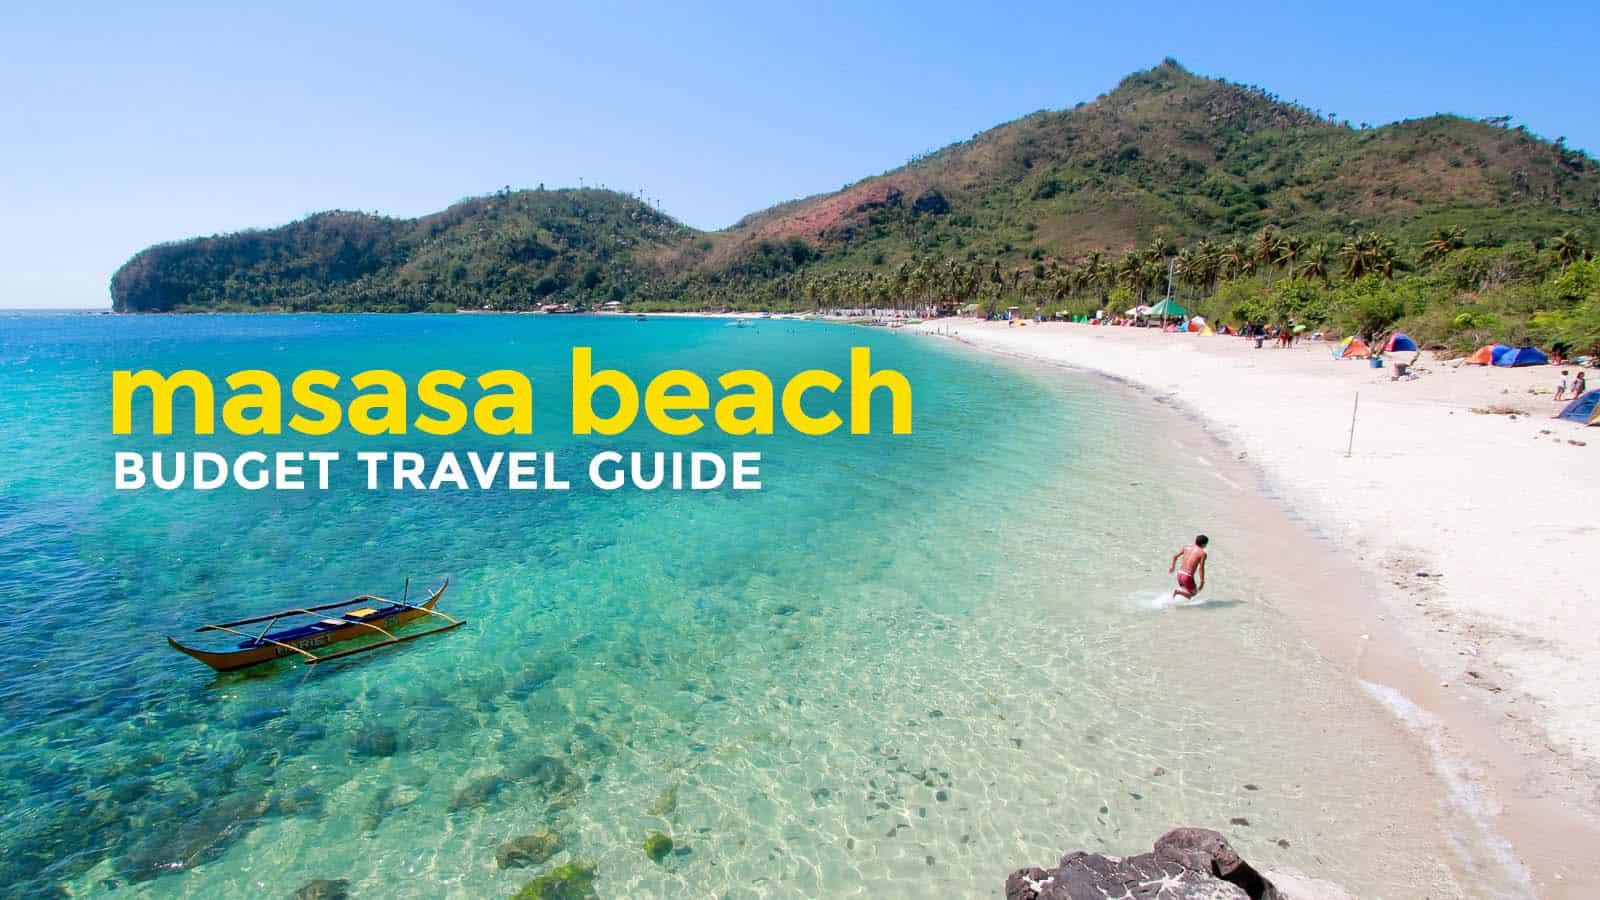 Masasa Beach Budget Travel Guide 2017 The Poor Traveler